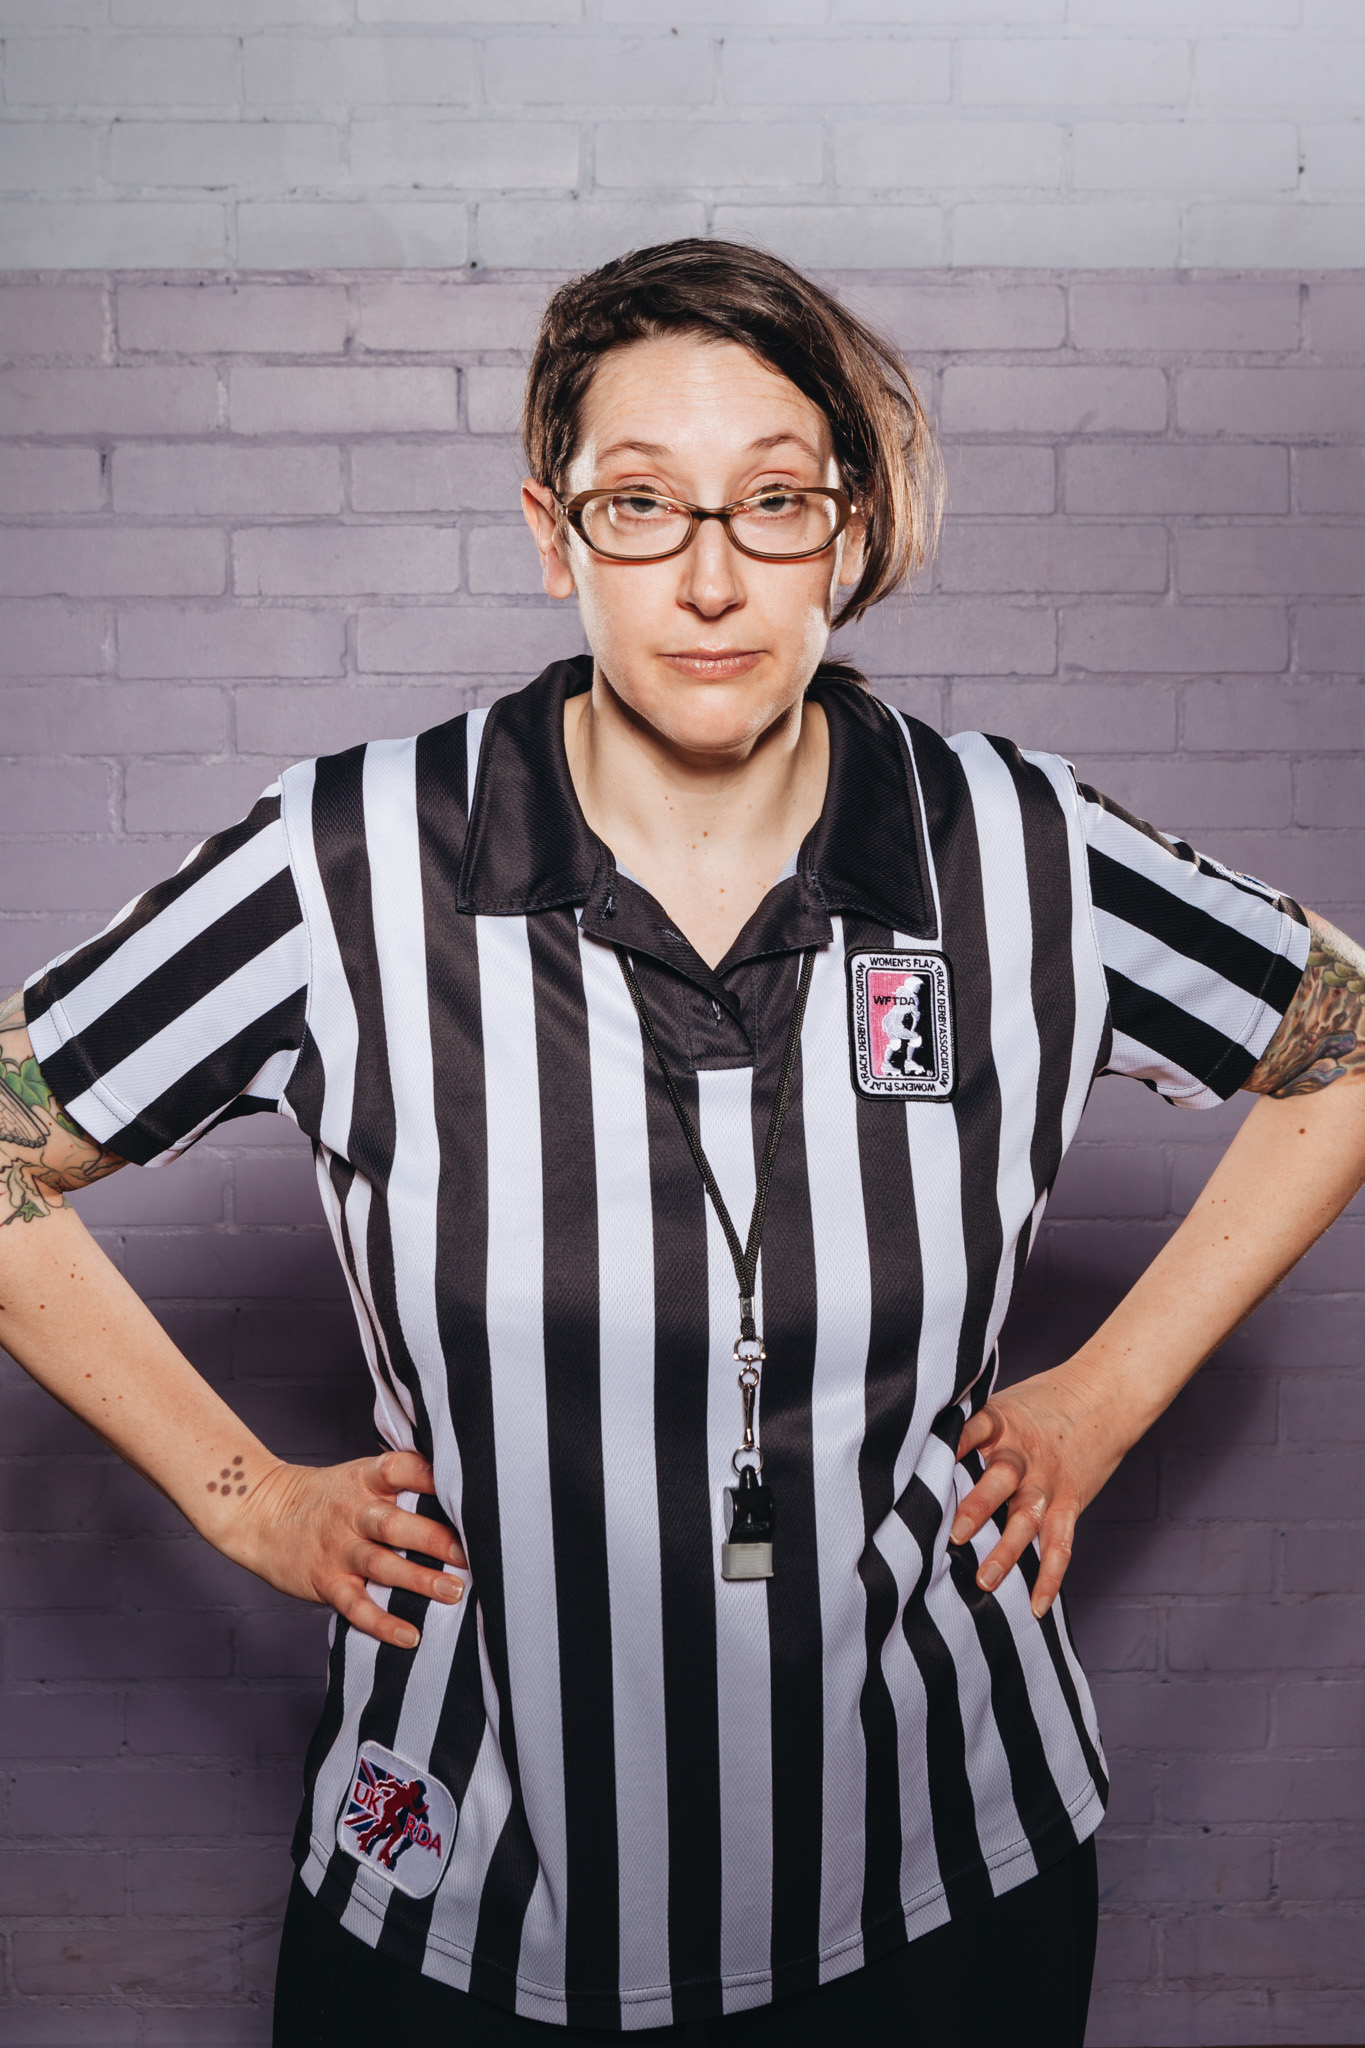 ©TomWoollard_Womens-Leeds-Roller-Derby-Team-Anti-G-Referee-0589.jpg